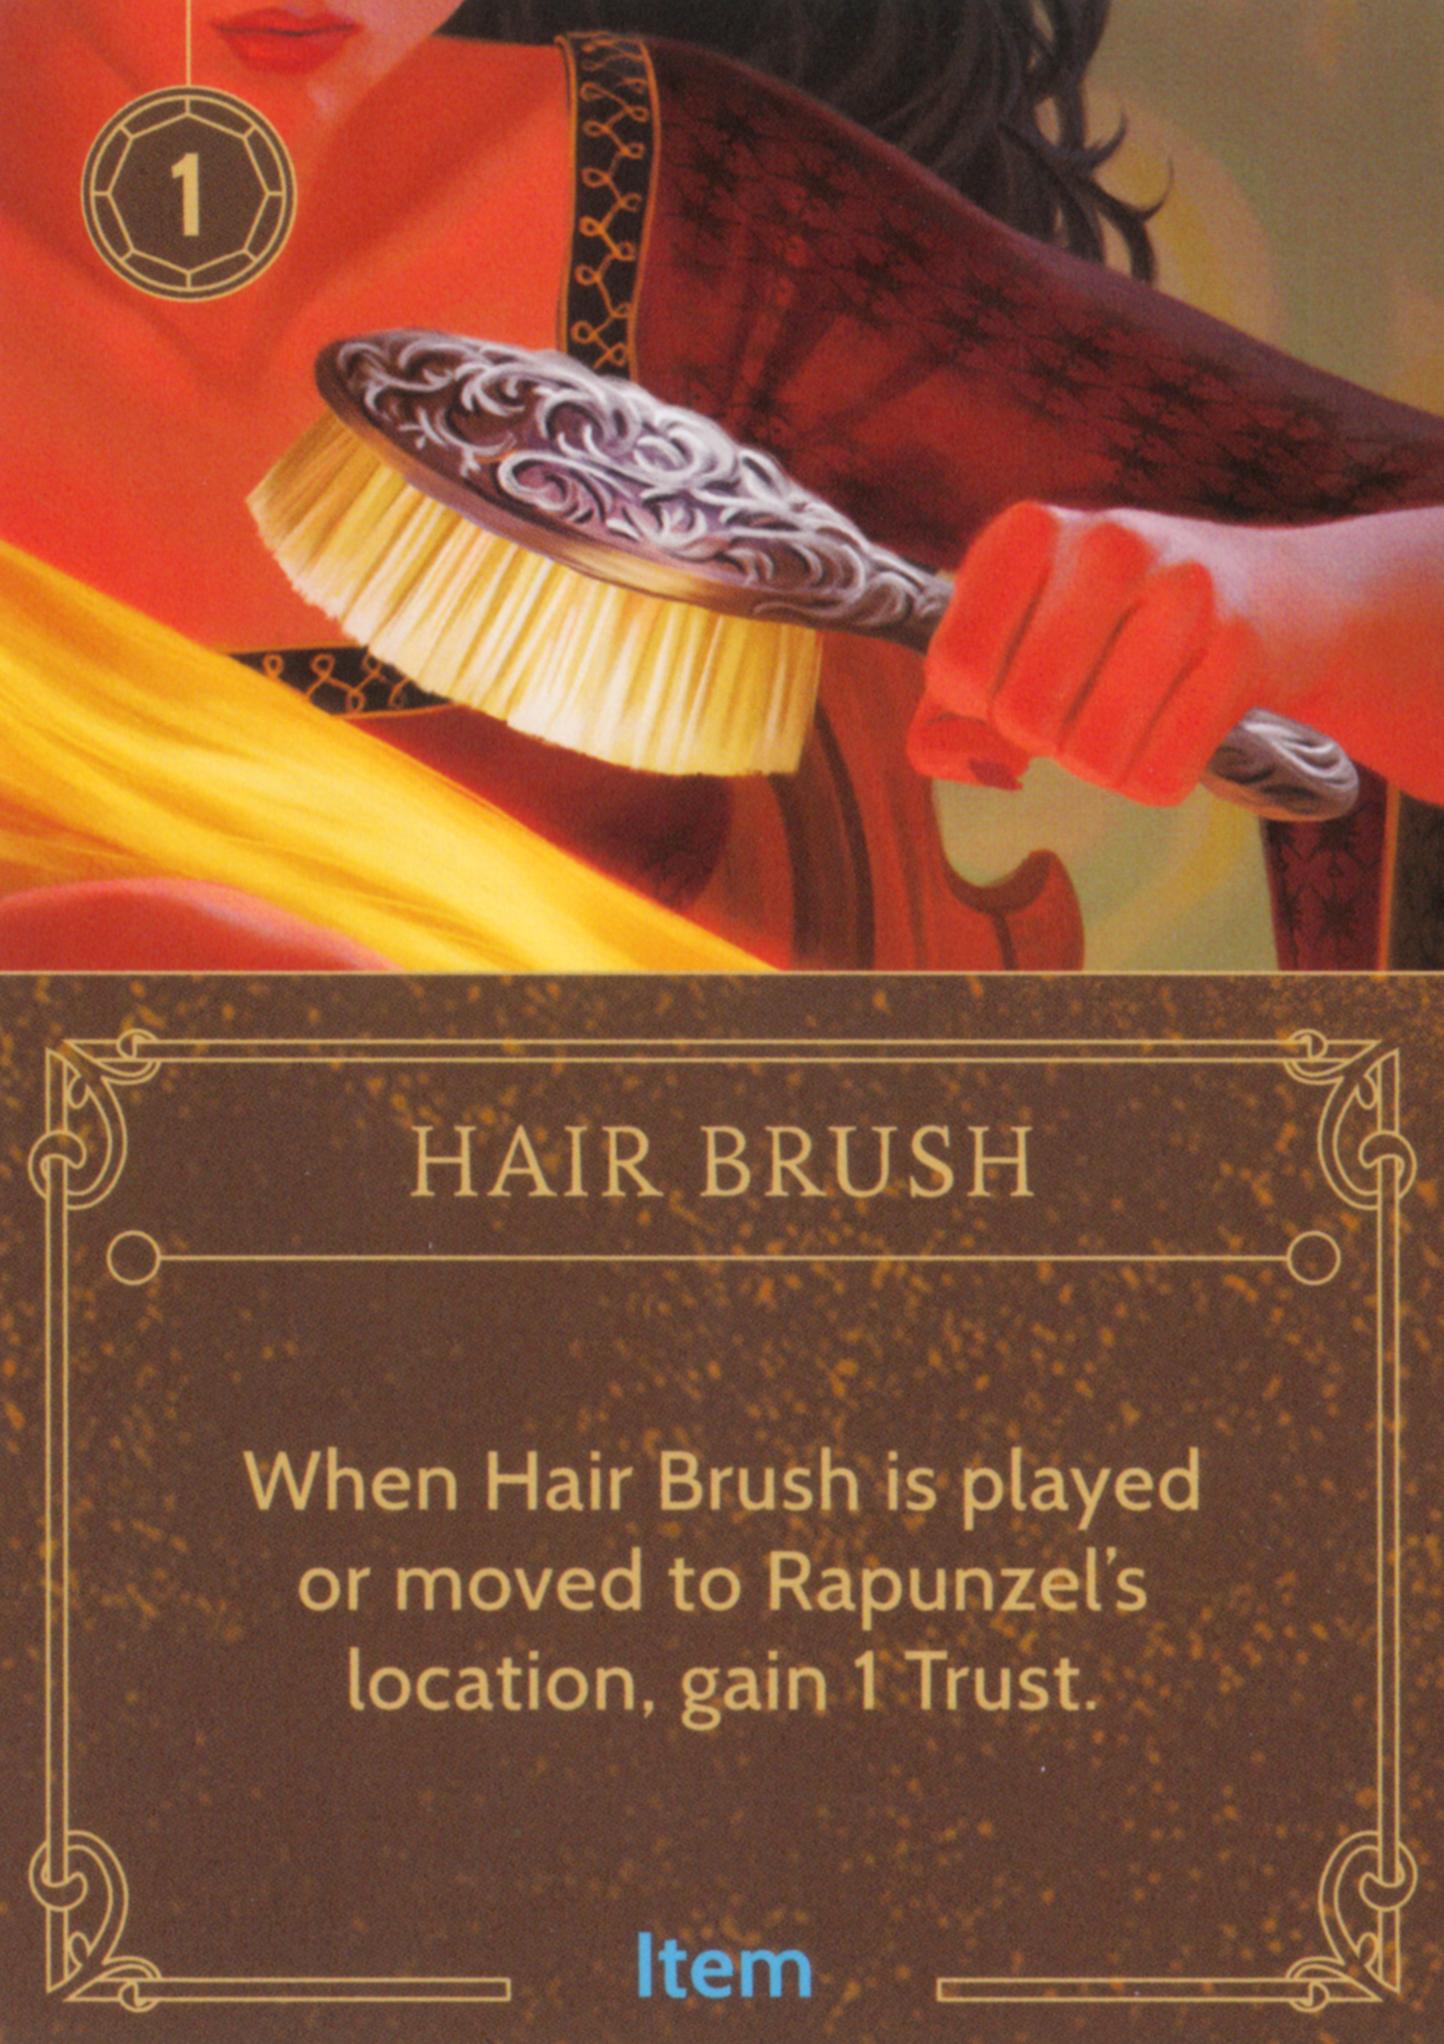 Hair Brush Disney Villainous Wiki Fandom